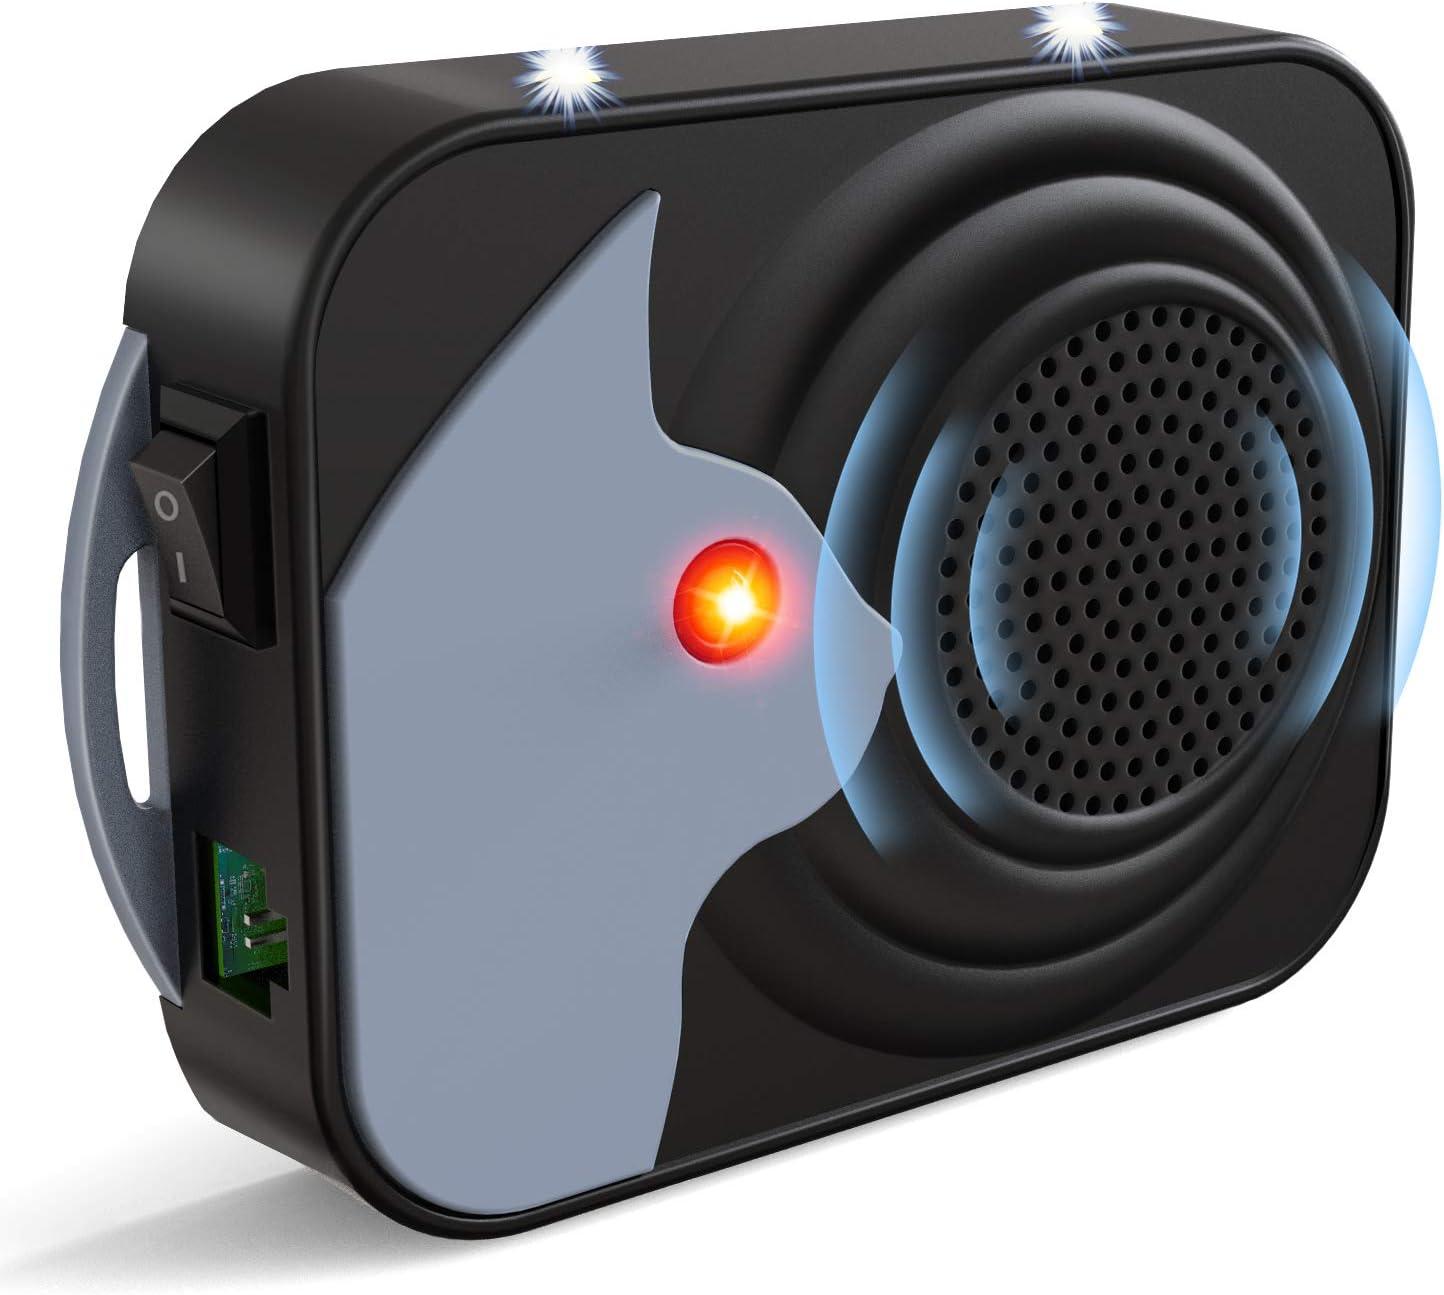 Ultrasonic Pest Repeller, Electronic Mouse Repellent, Under Hood Animal Repeller, Mice Control Devices Rodent Deterrent Defense Rat Marten with LED Strobe Lights for Car Engine (Black)